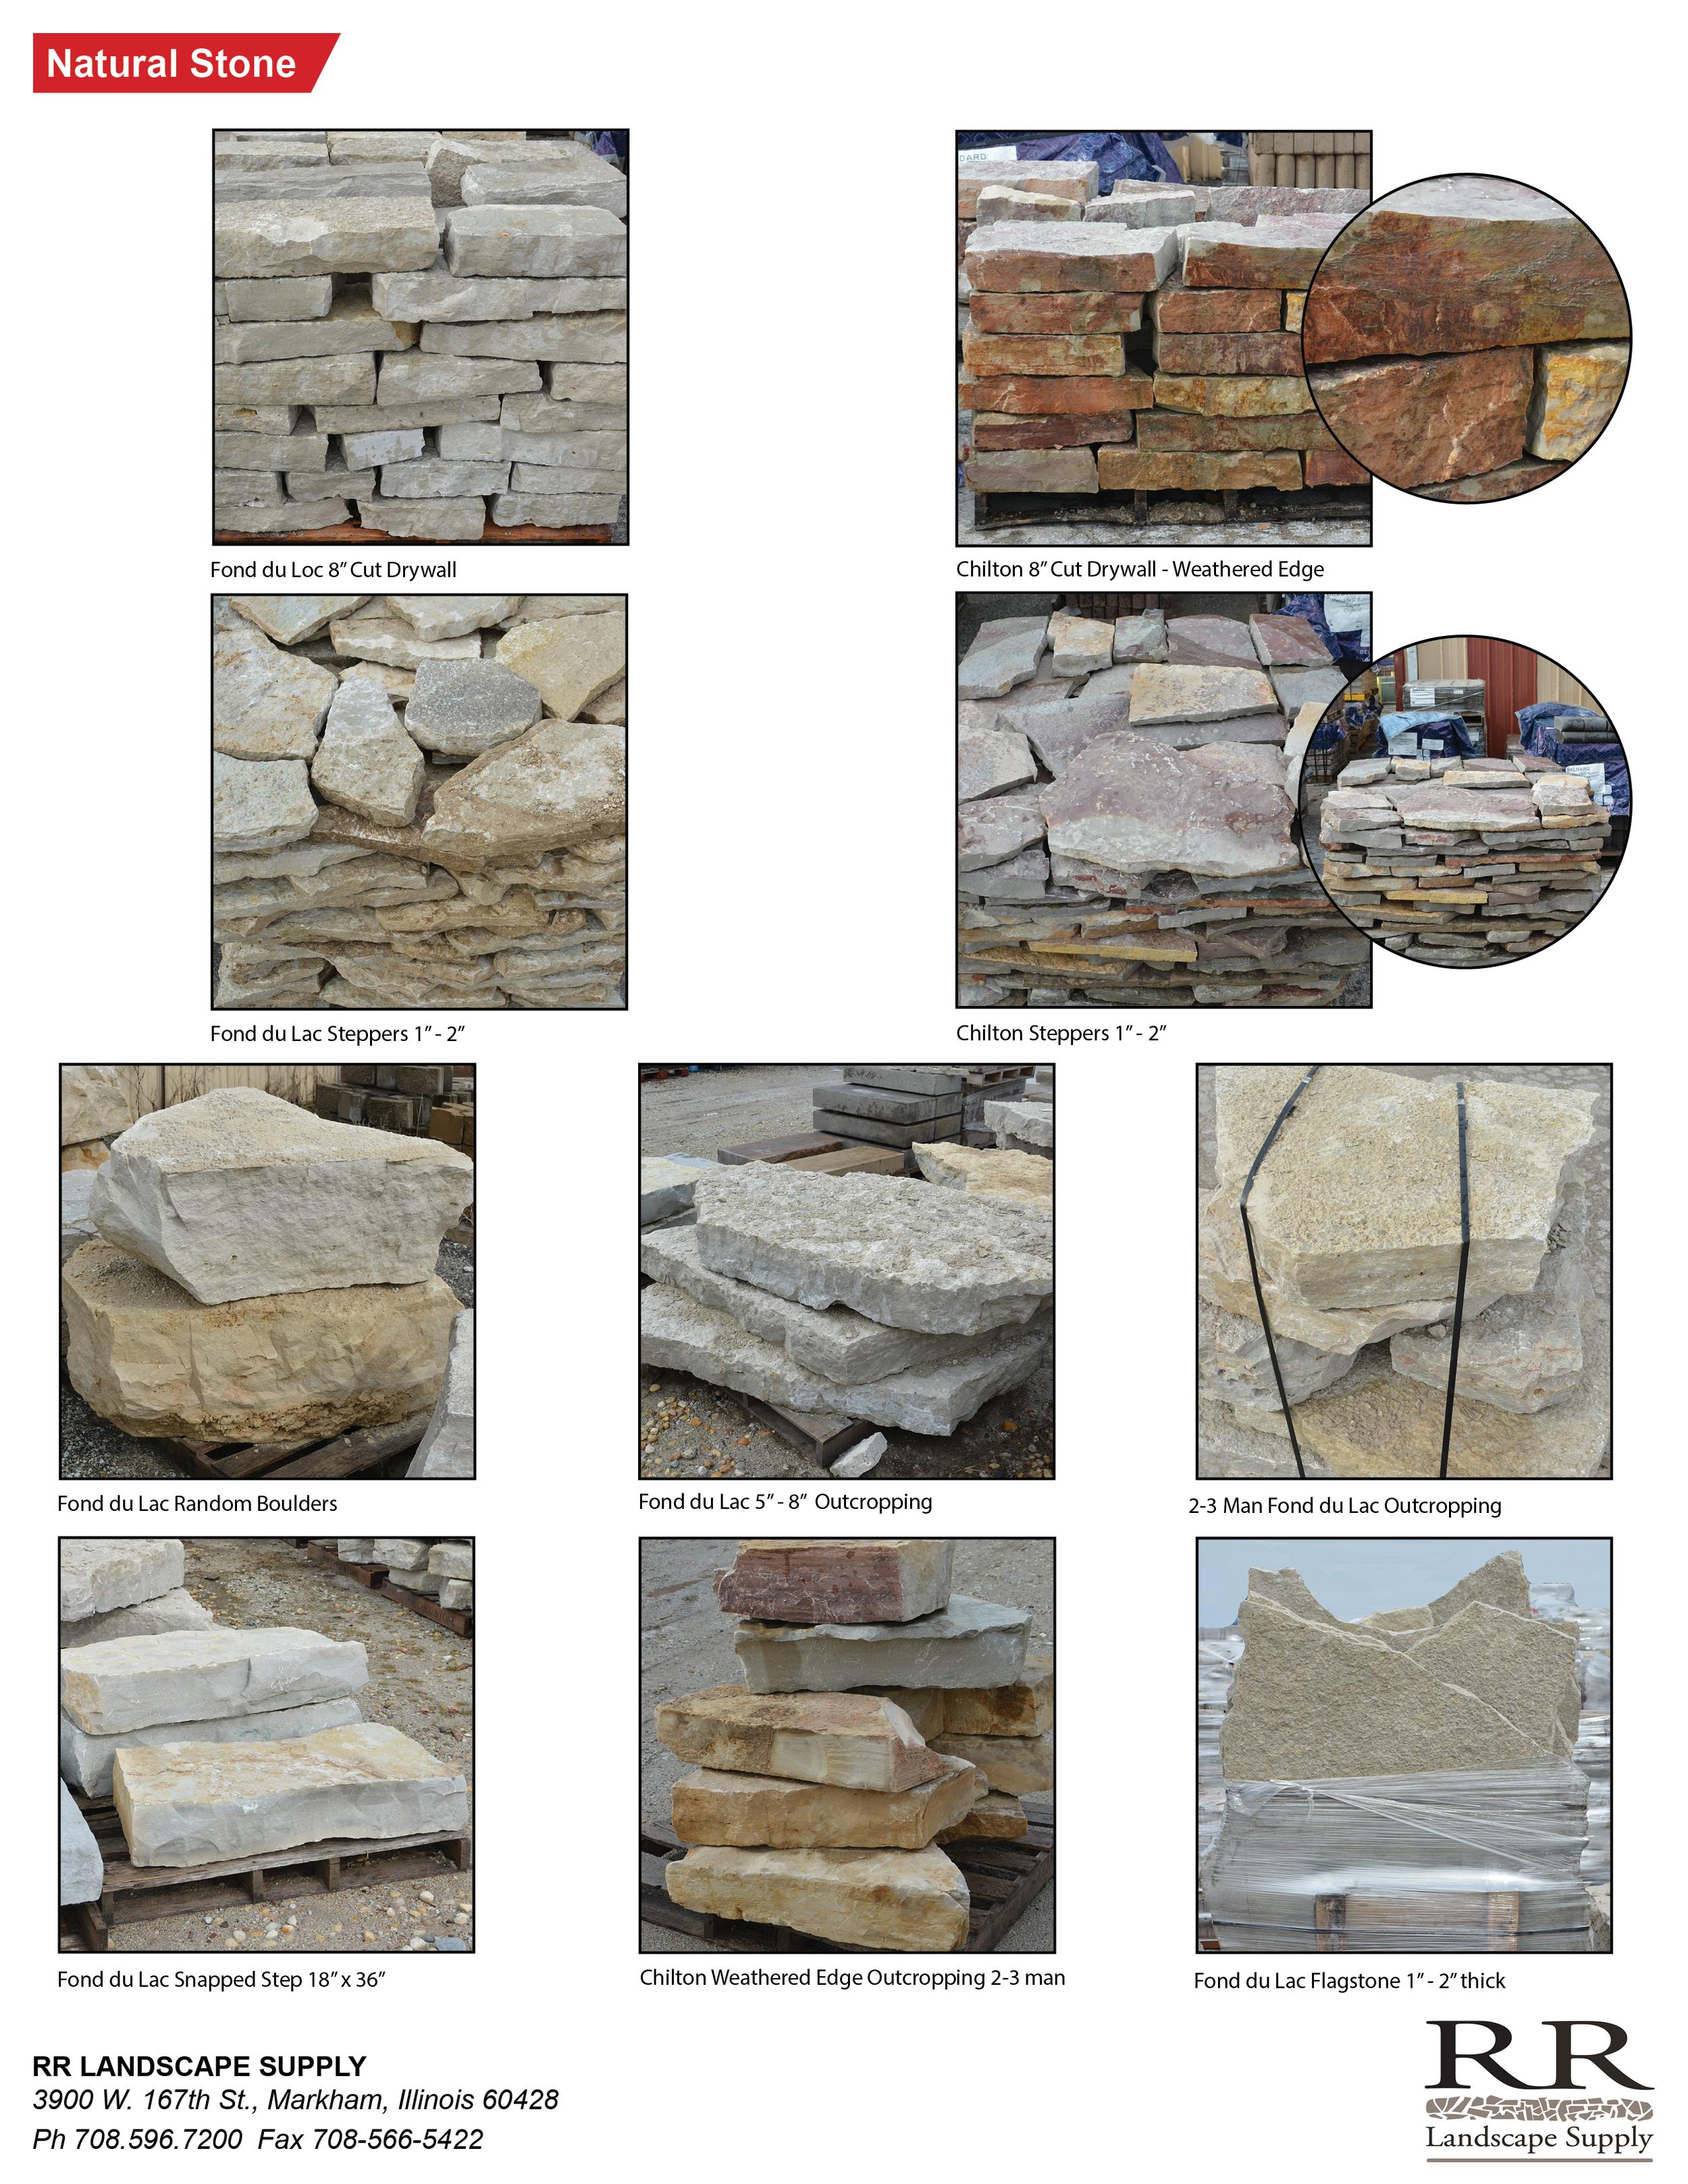 RR Landscape Supply_Bulk Stone Image Guide2.png